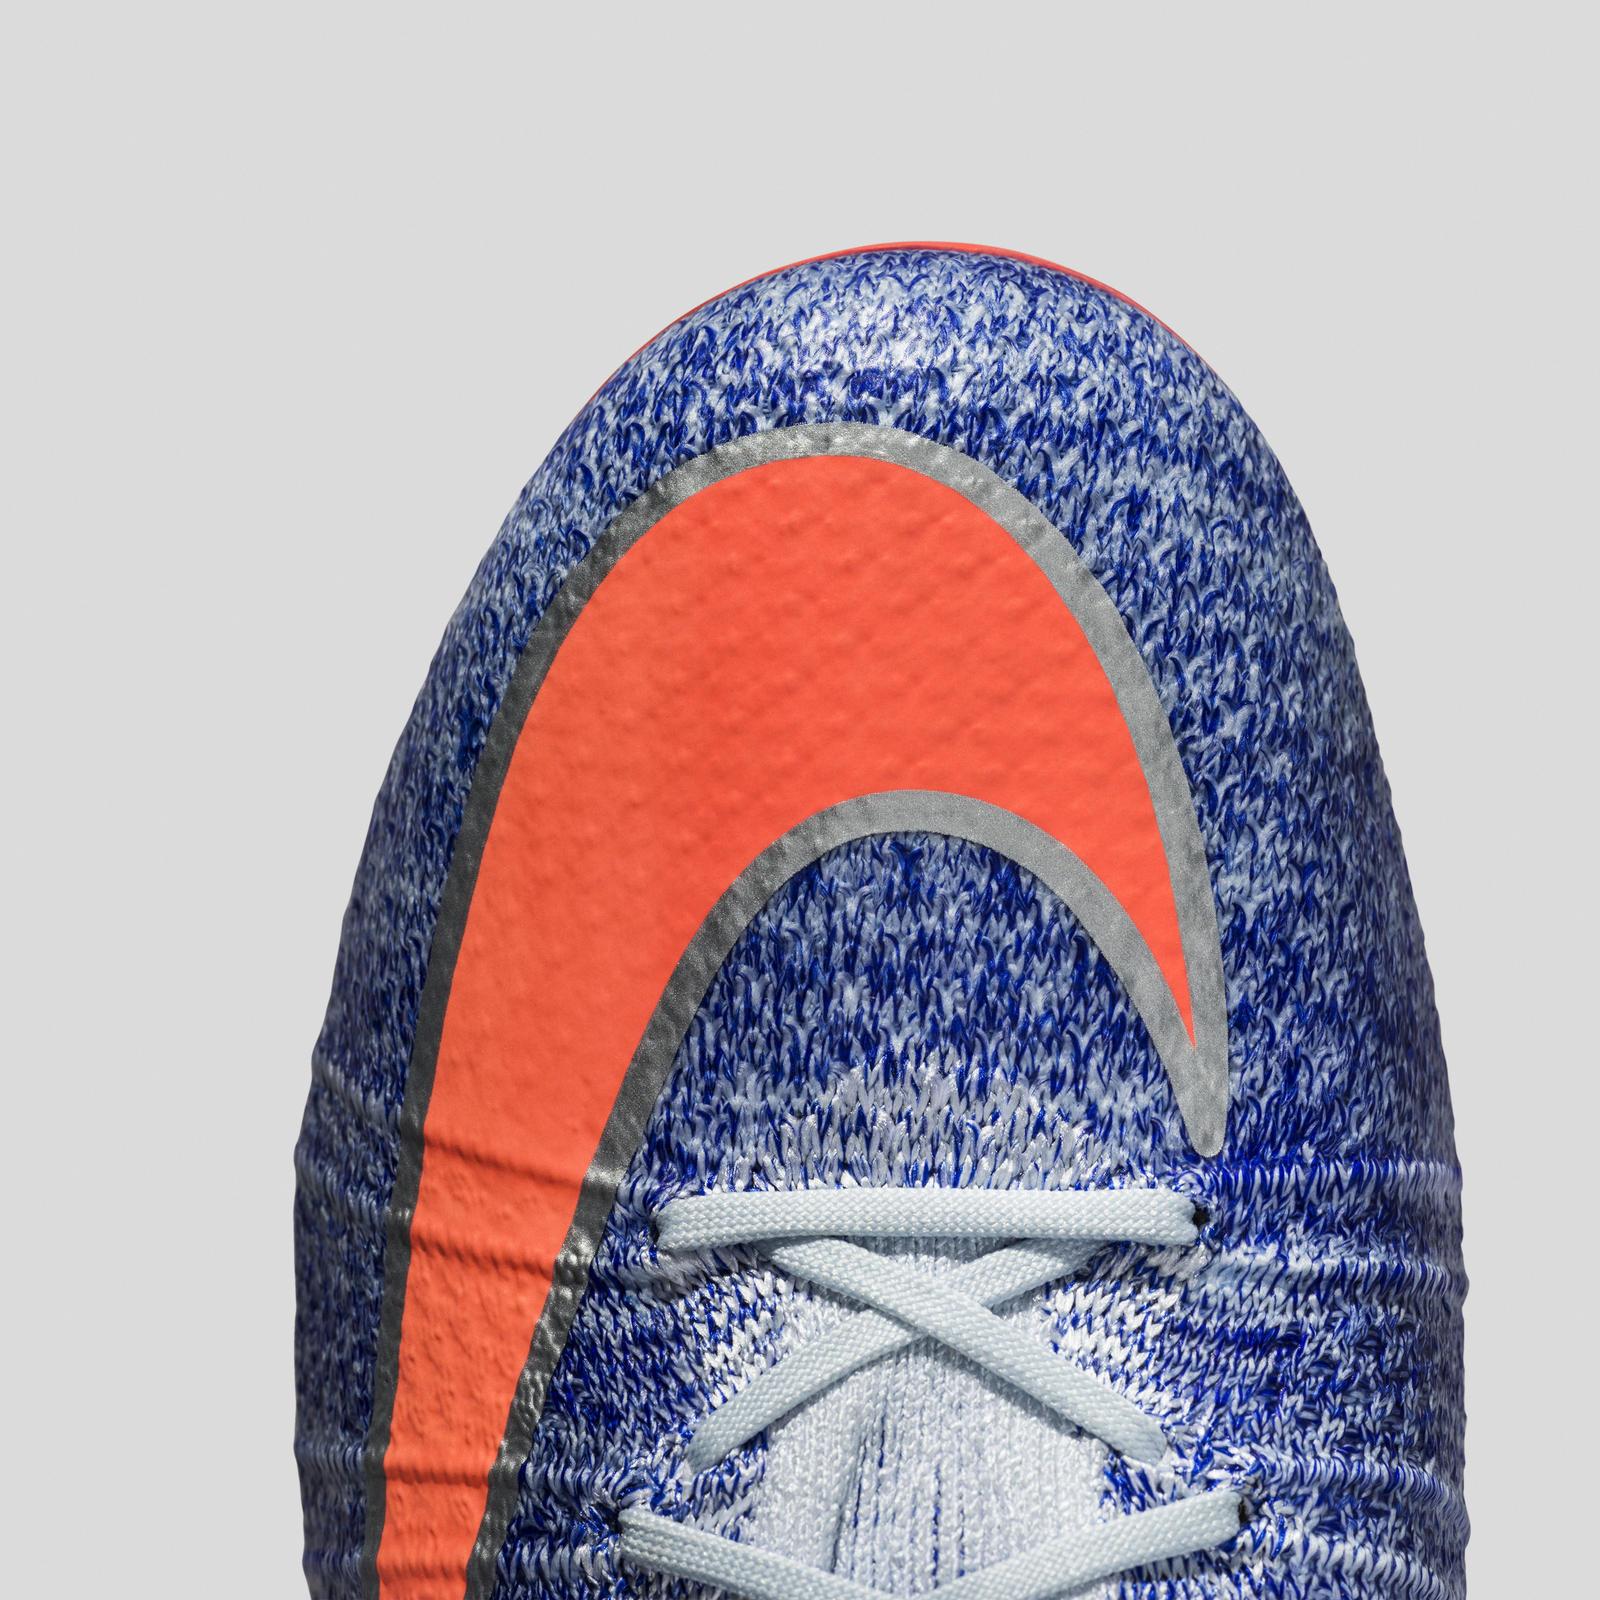 Nike Glbl Football Wmns Sp16 Merc Sprfly Toe